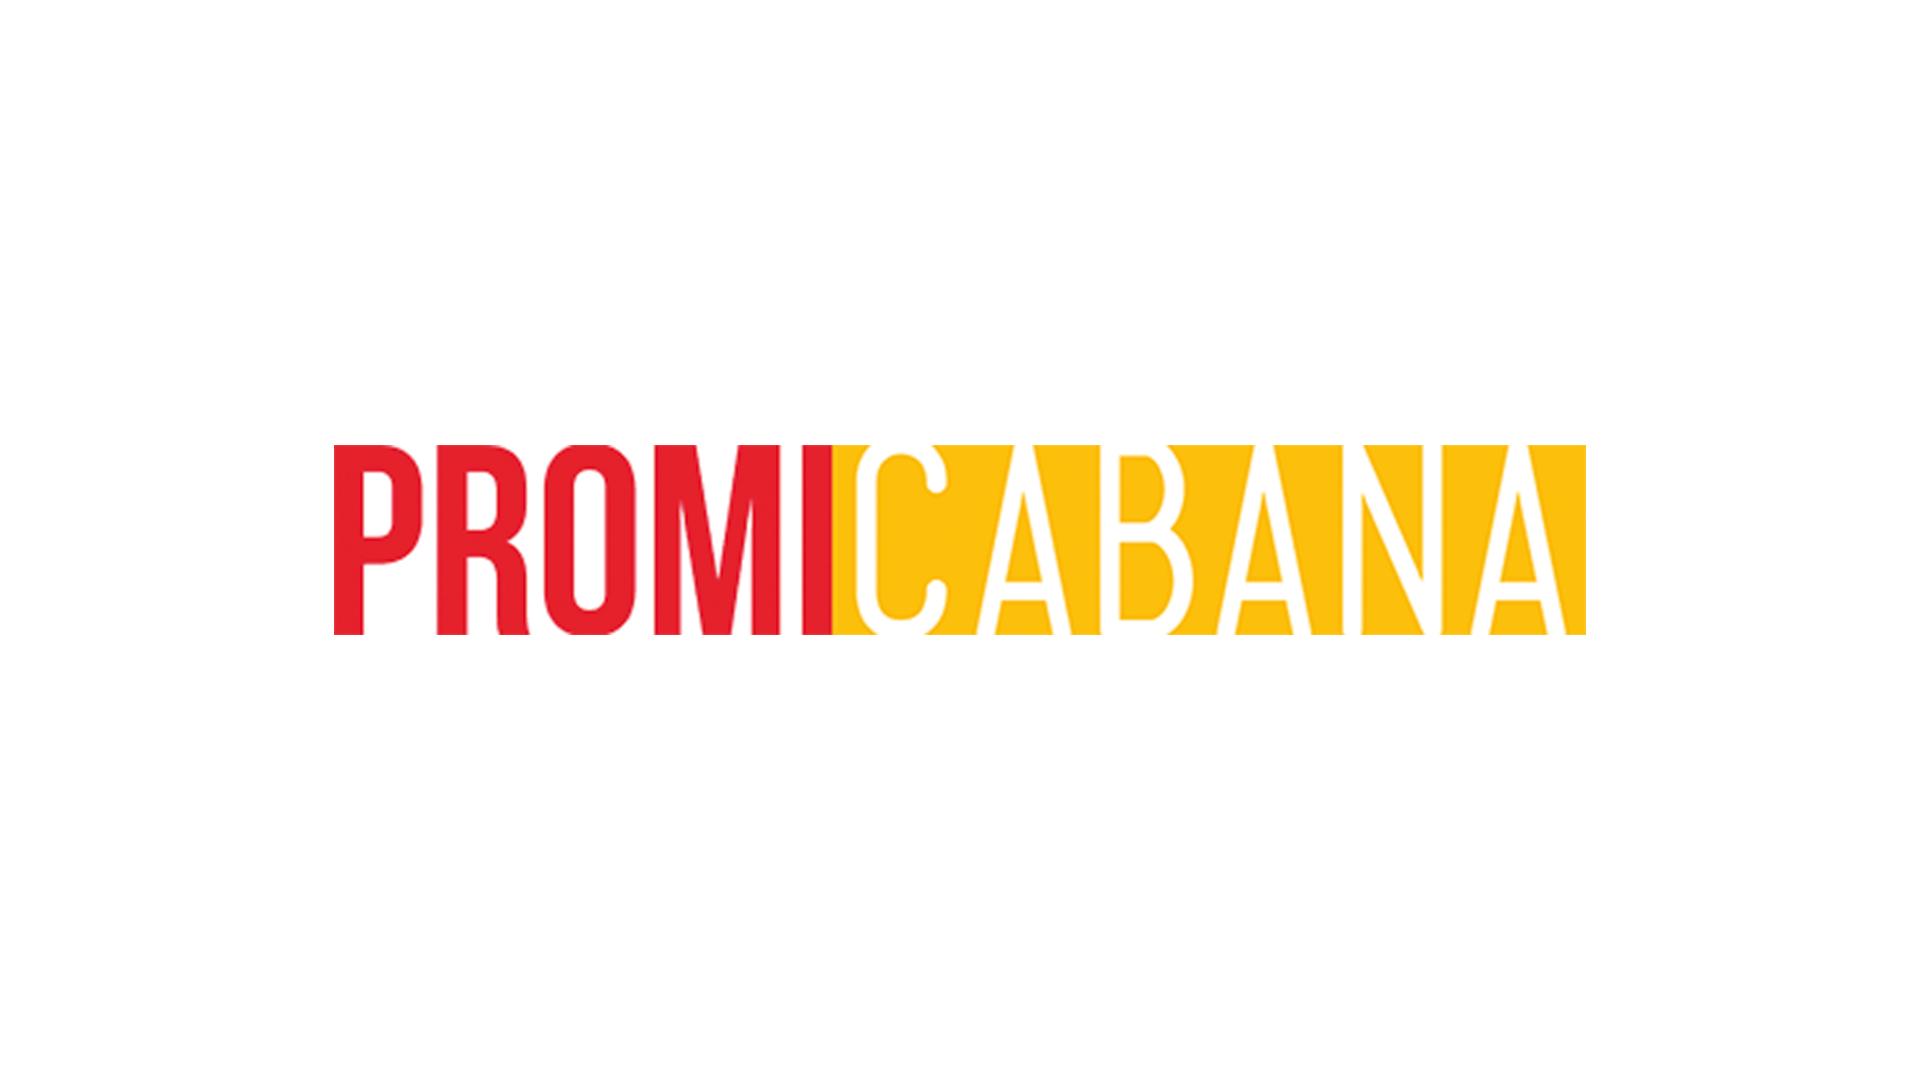 Channing-Tatum-Taron-Egerton-Kingsman-The-Golden-Circle-Trailer